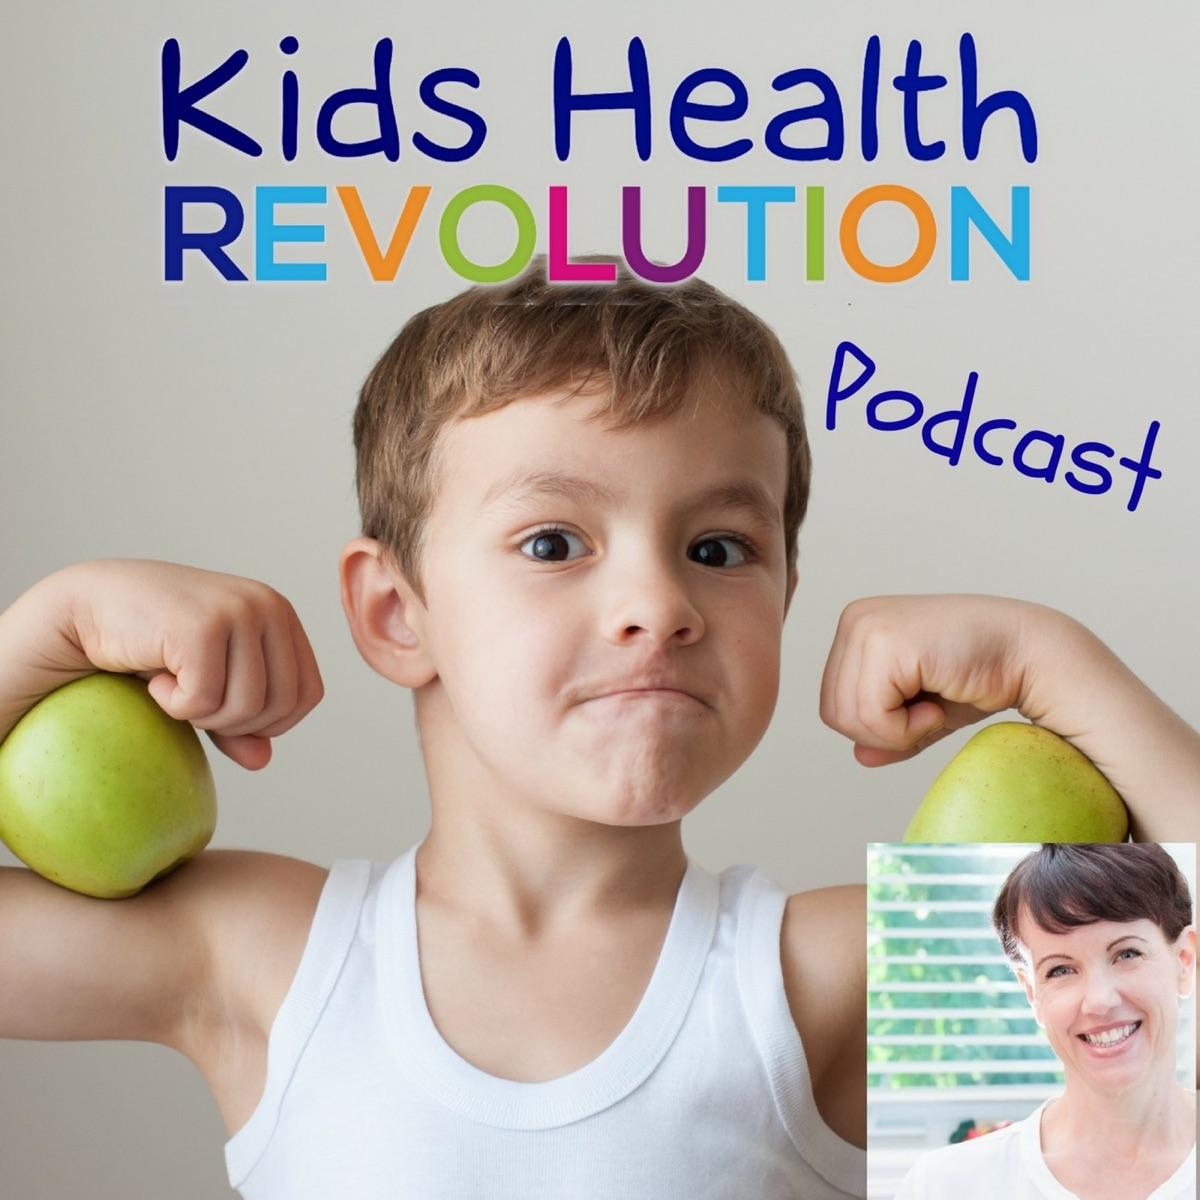 kidshealthrevolution podcast